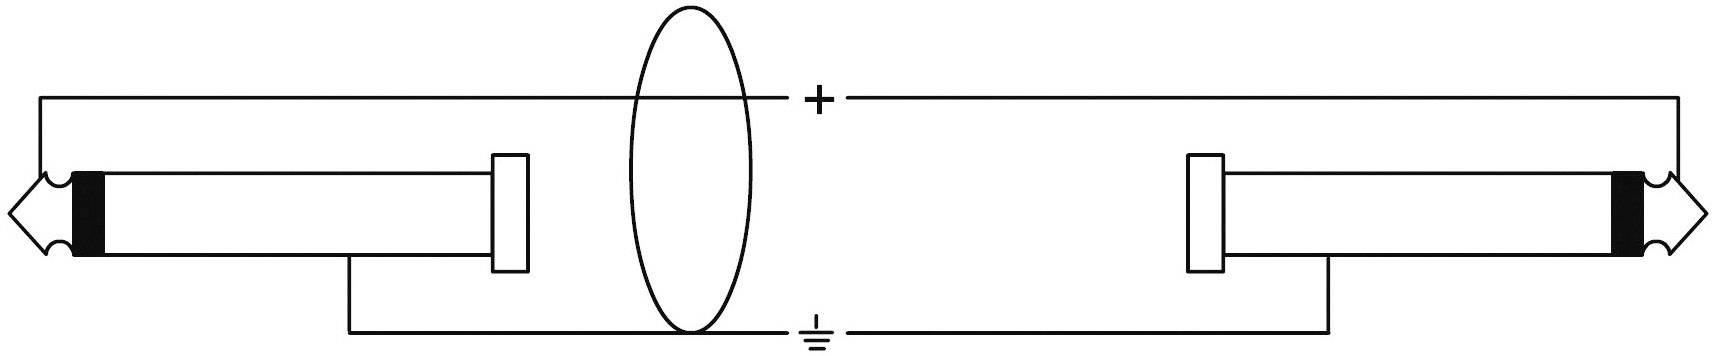 Kabel Cordial CPL 5 PP, [1x jack zástrčka 6,3 mm - 1x jack zástrčka 6,3 mm], 5 m, černá